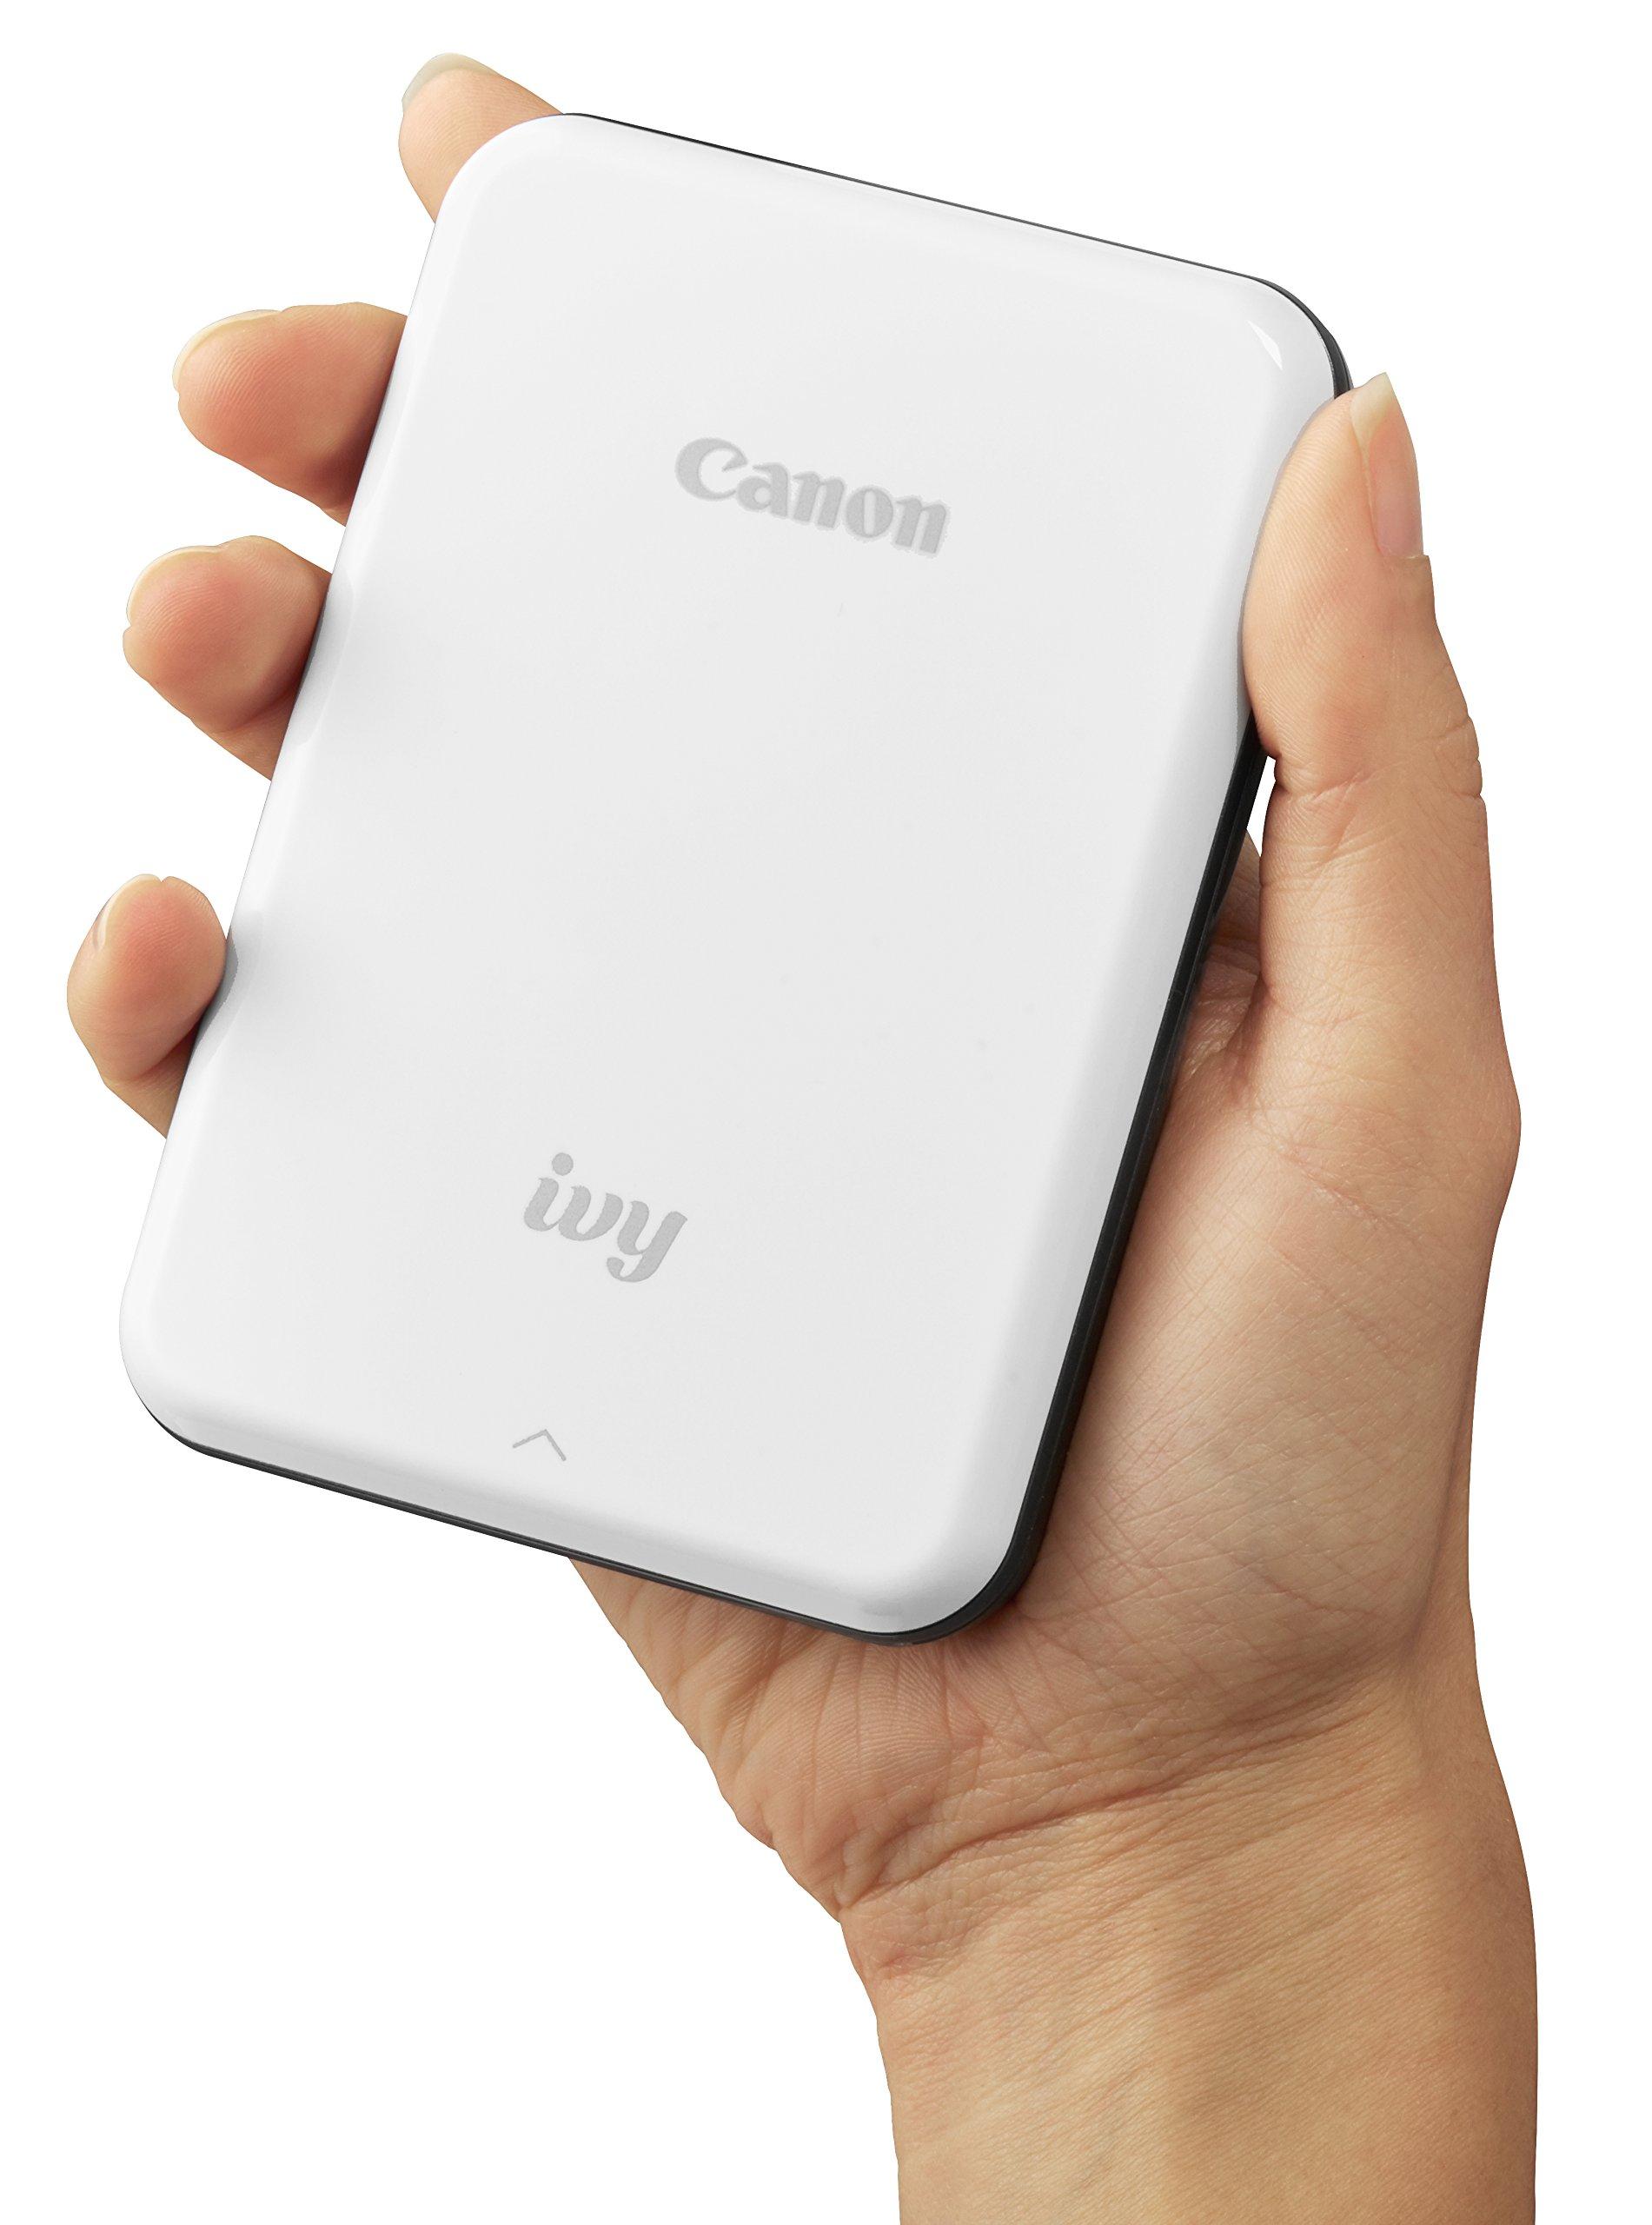 Canon IVY Mobile Mini Photo Printer through Bluetooth(R), Slate Gray by Canon (Image #6)